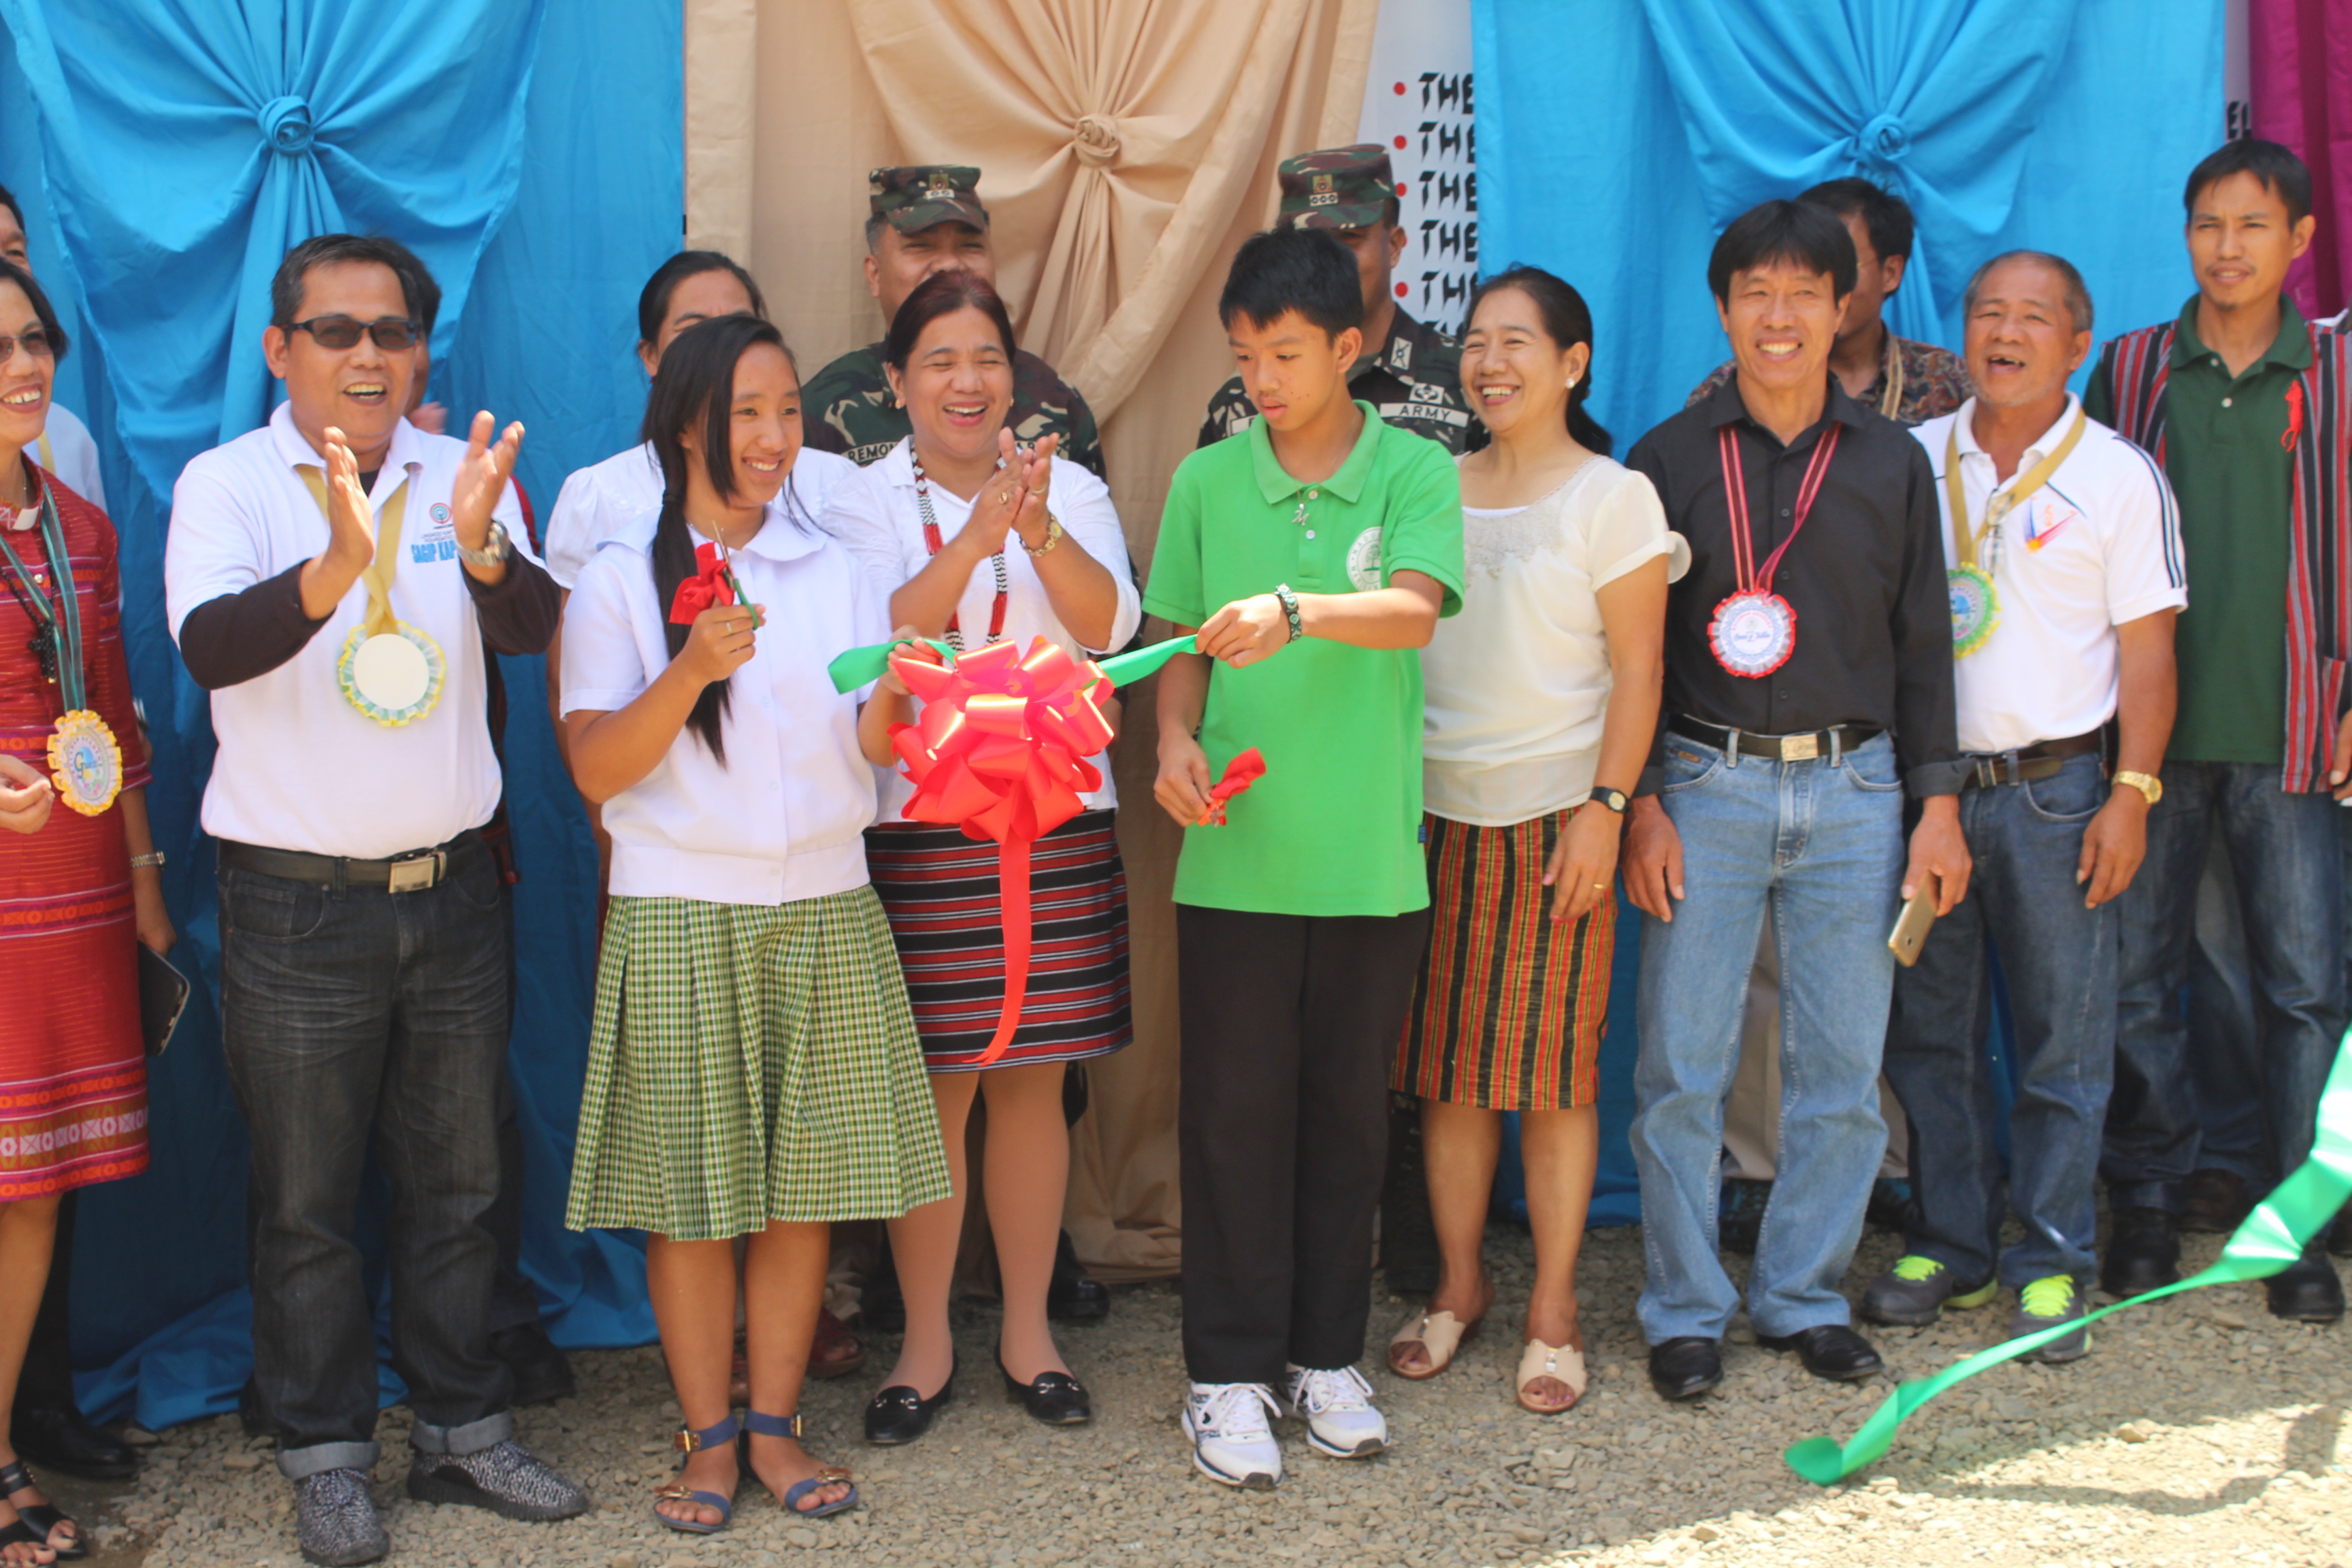 A student  Kalahan Academy in Barangay Imugan, Sta. Fe, Nueva Vizcaya